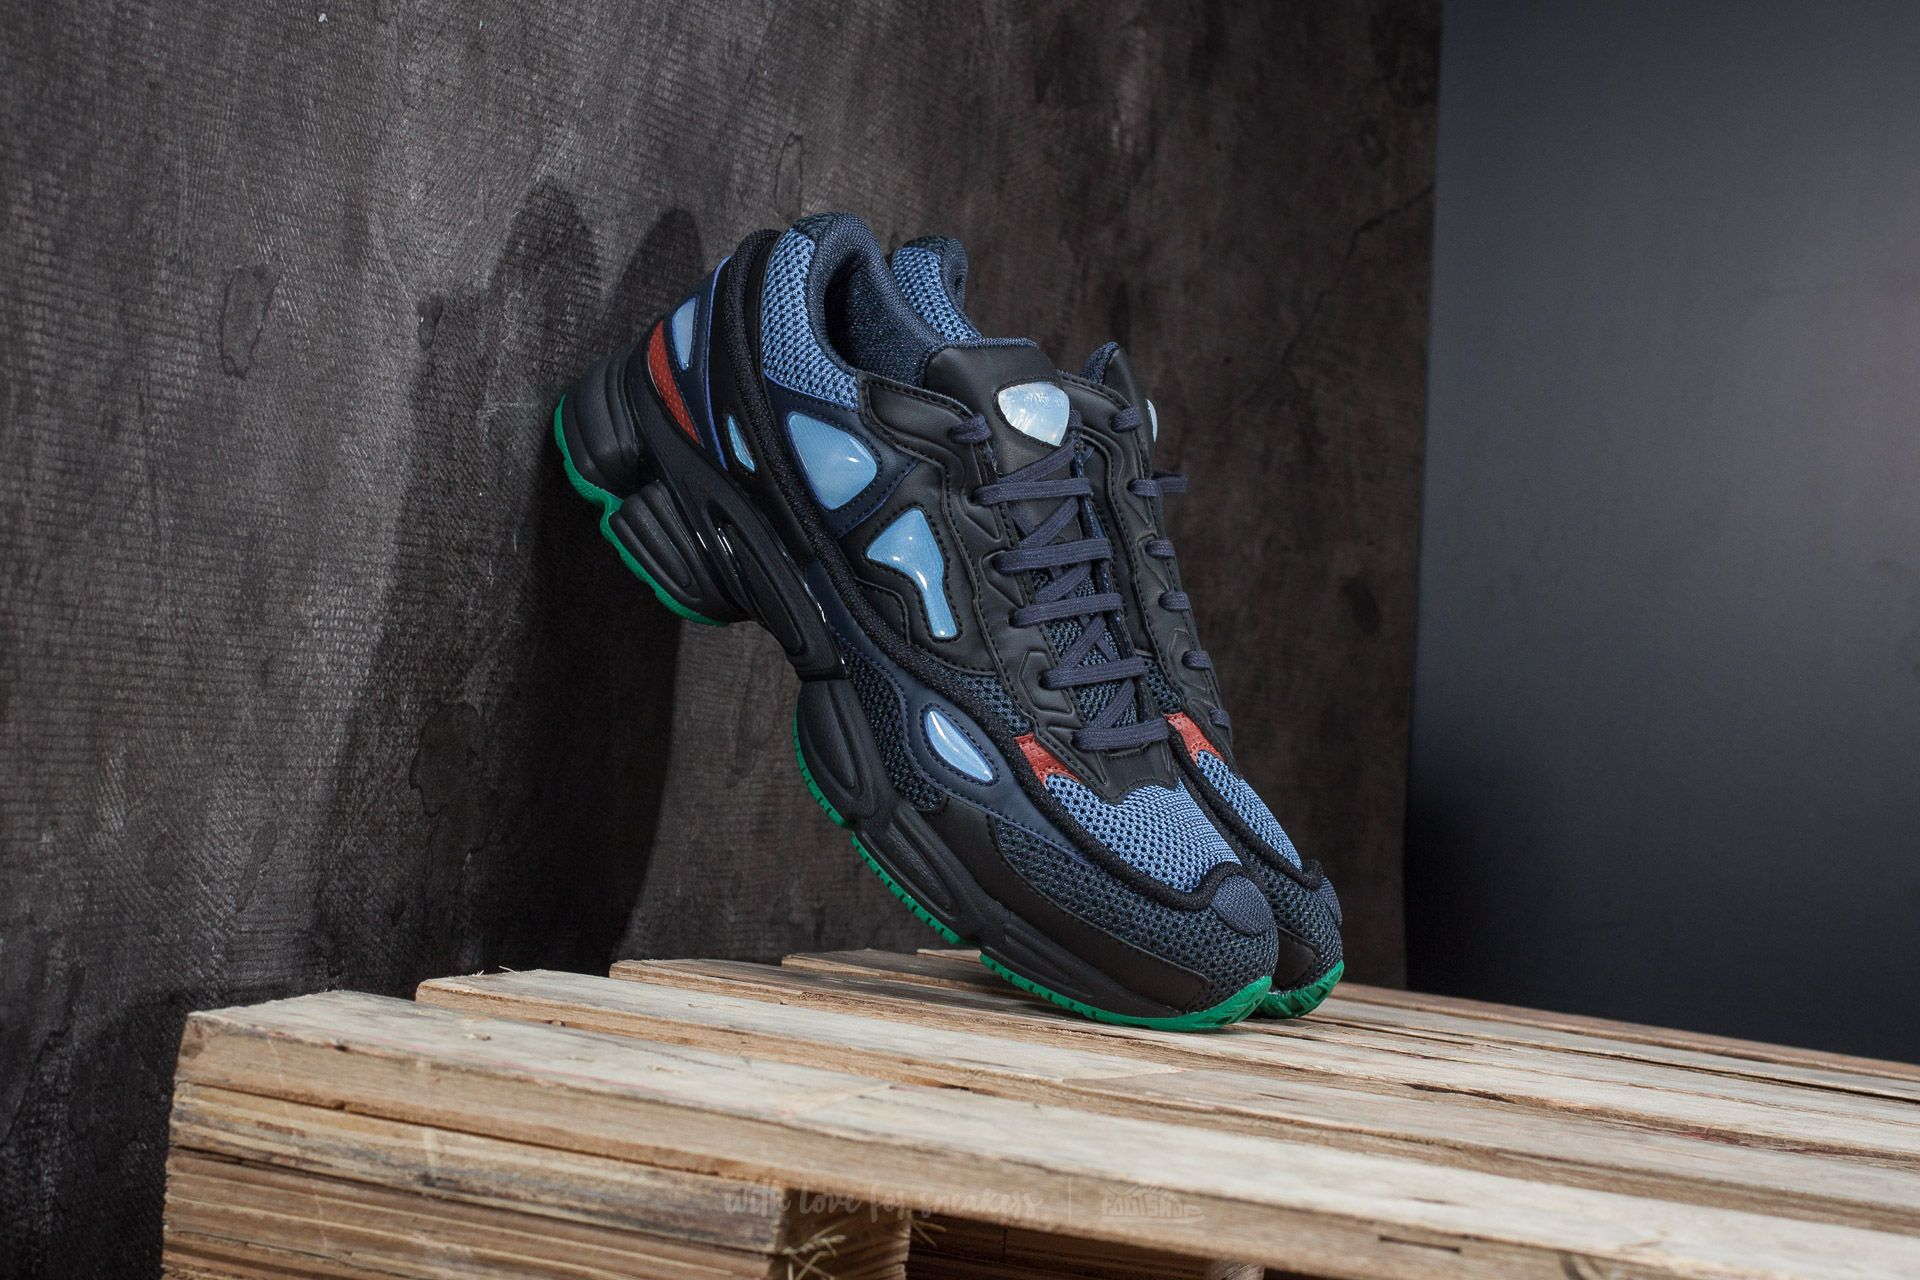 factory price 5674b 099da adidas x Raf Simons Ozweego 2